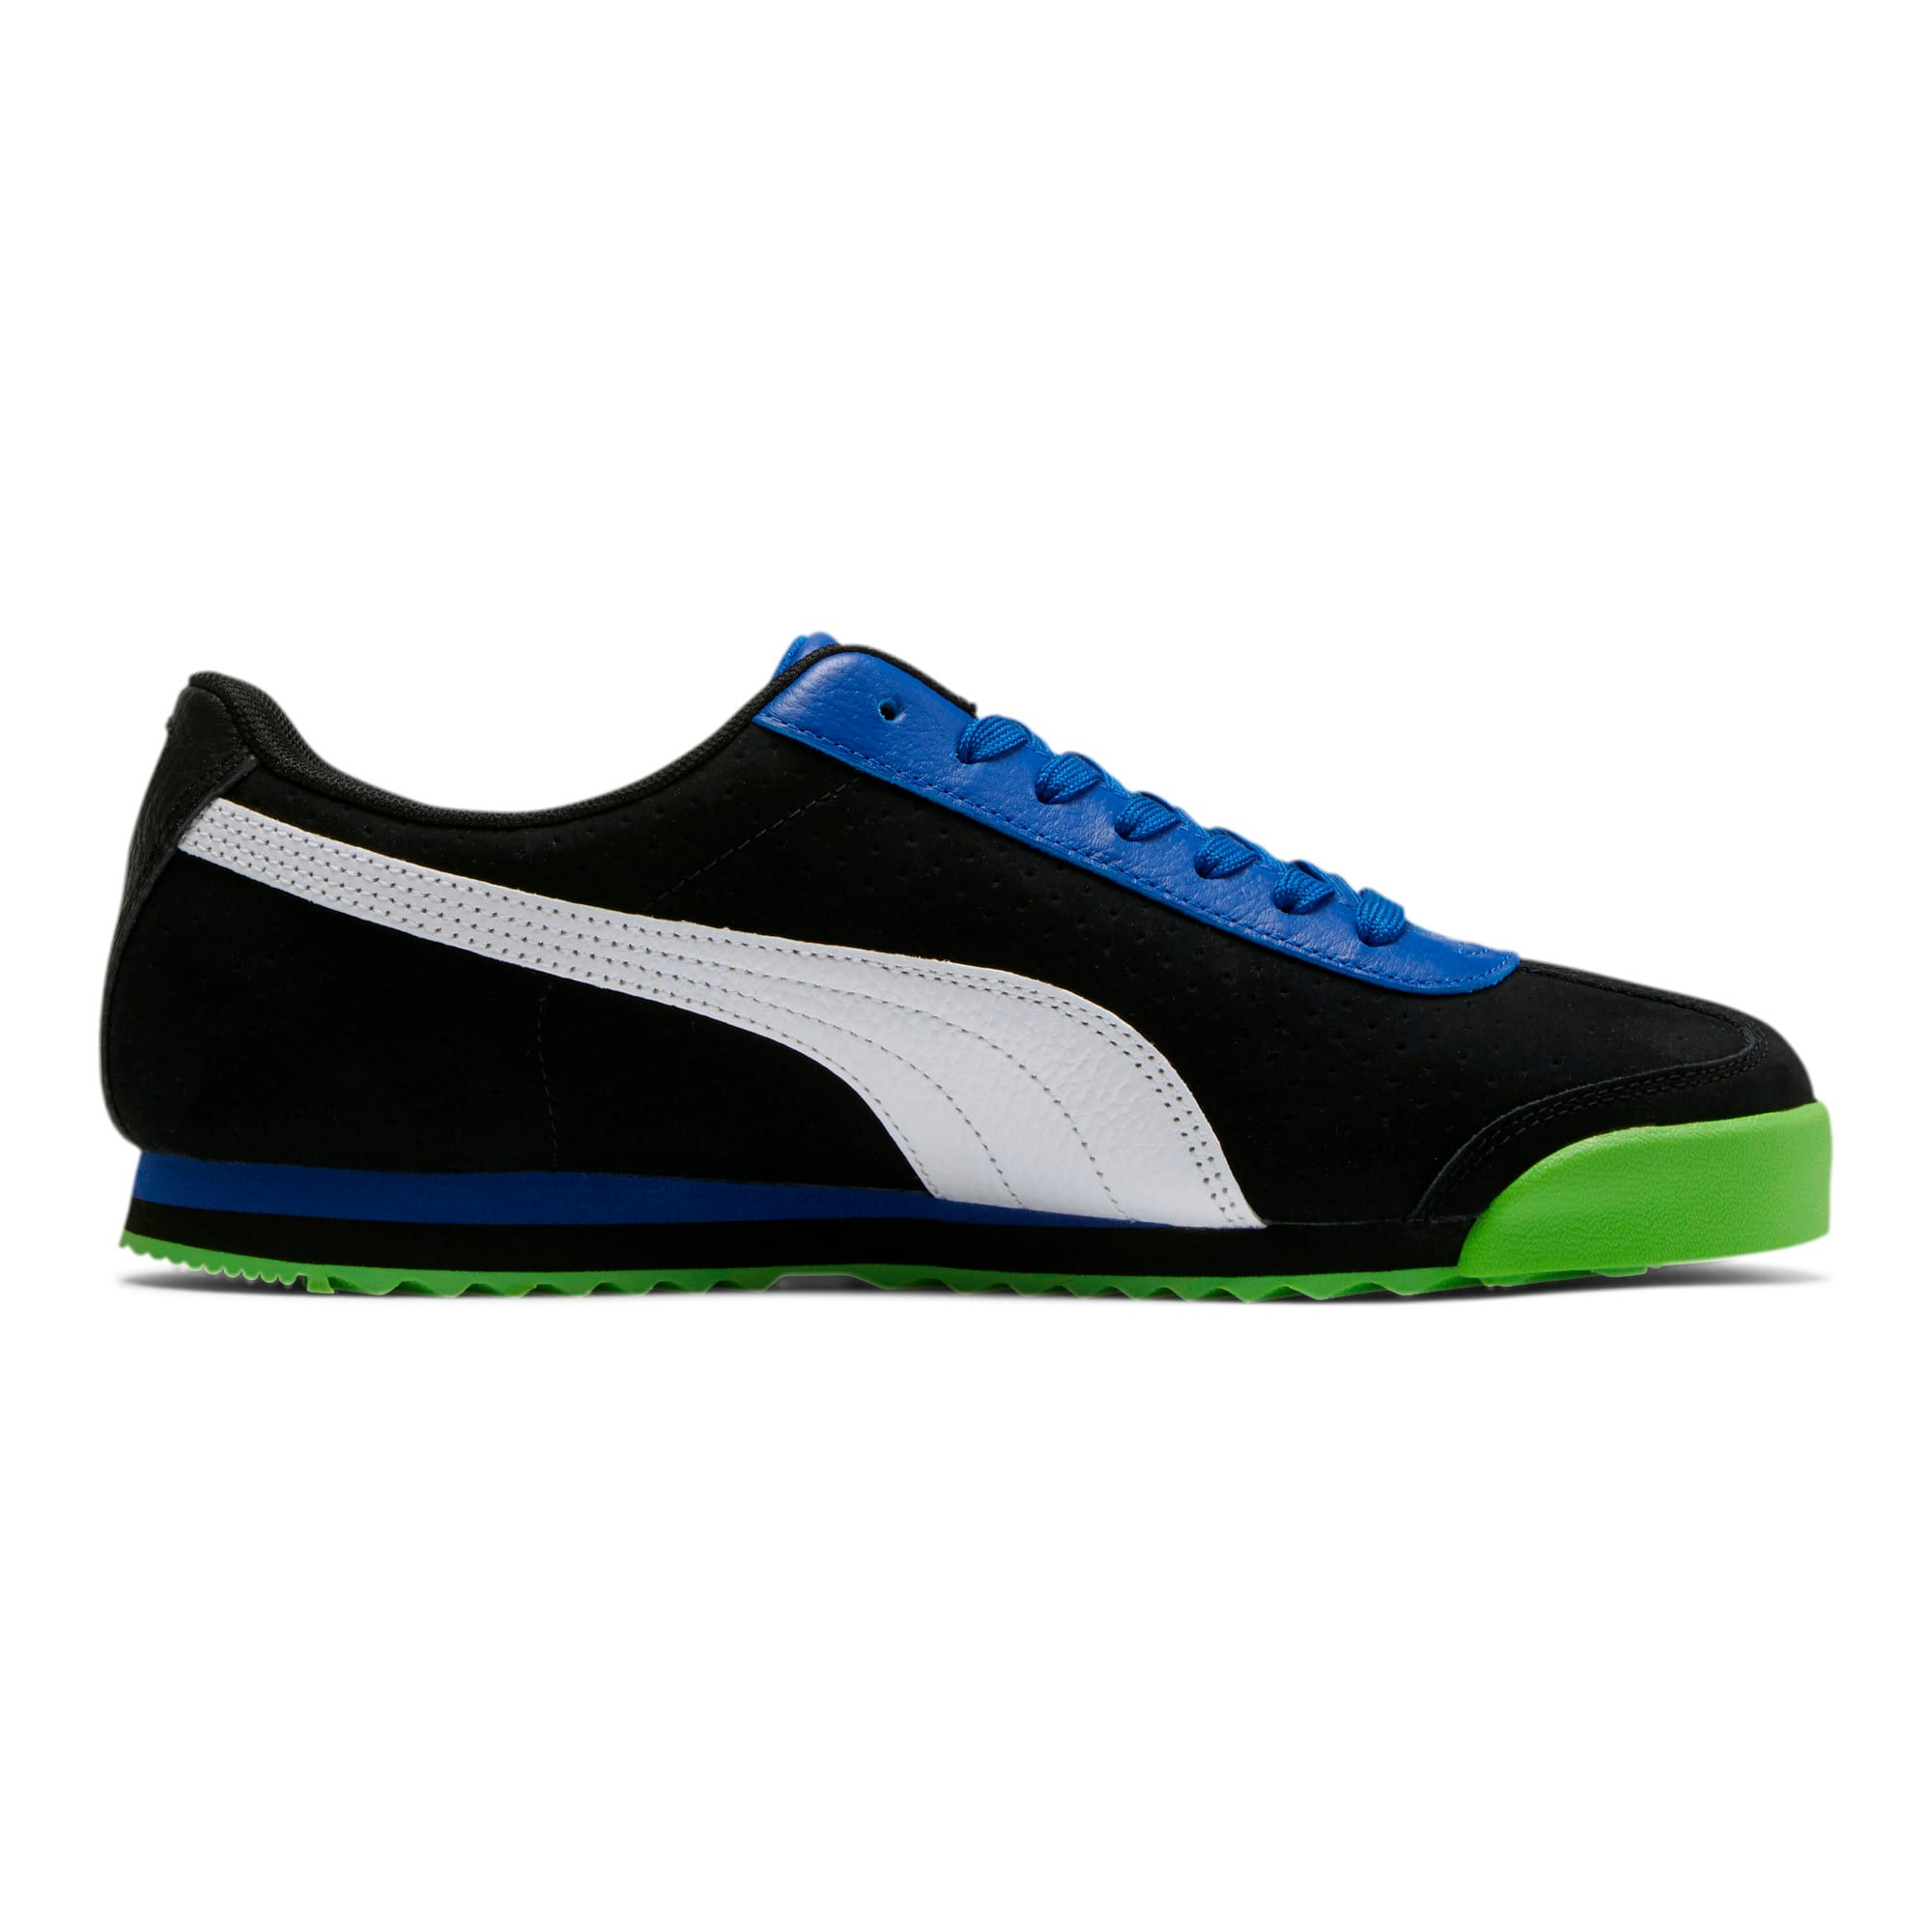 Thumbnail 5 of Roma XTG Perf Men's Sneakers, Puma Black-Surf The Web, medium